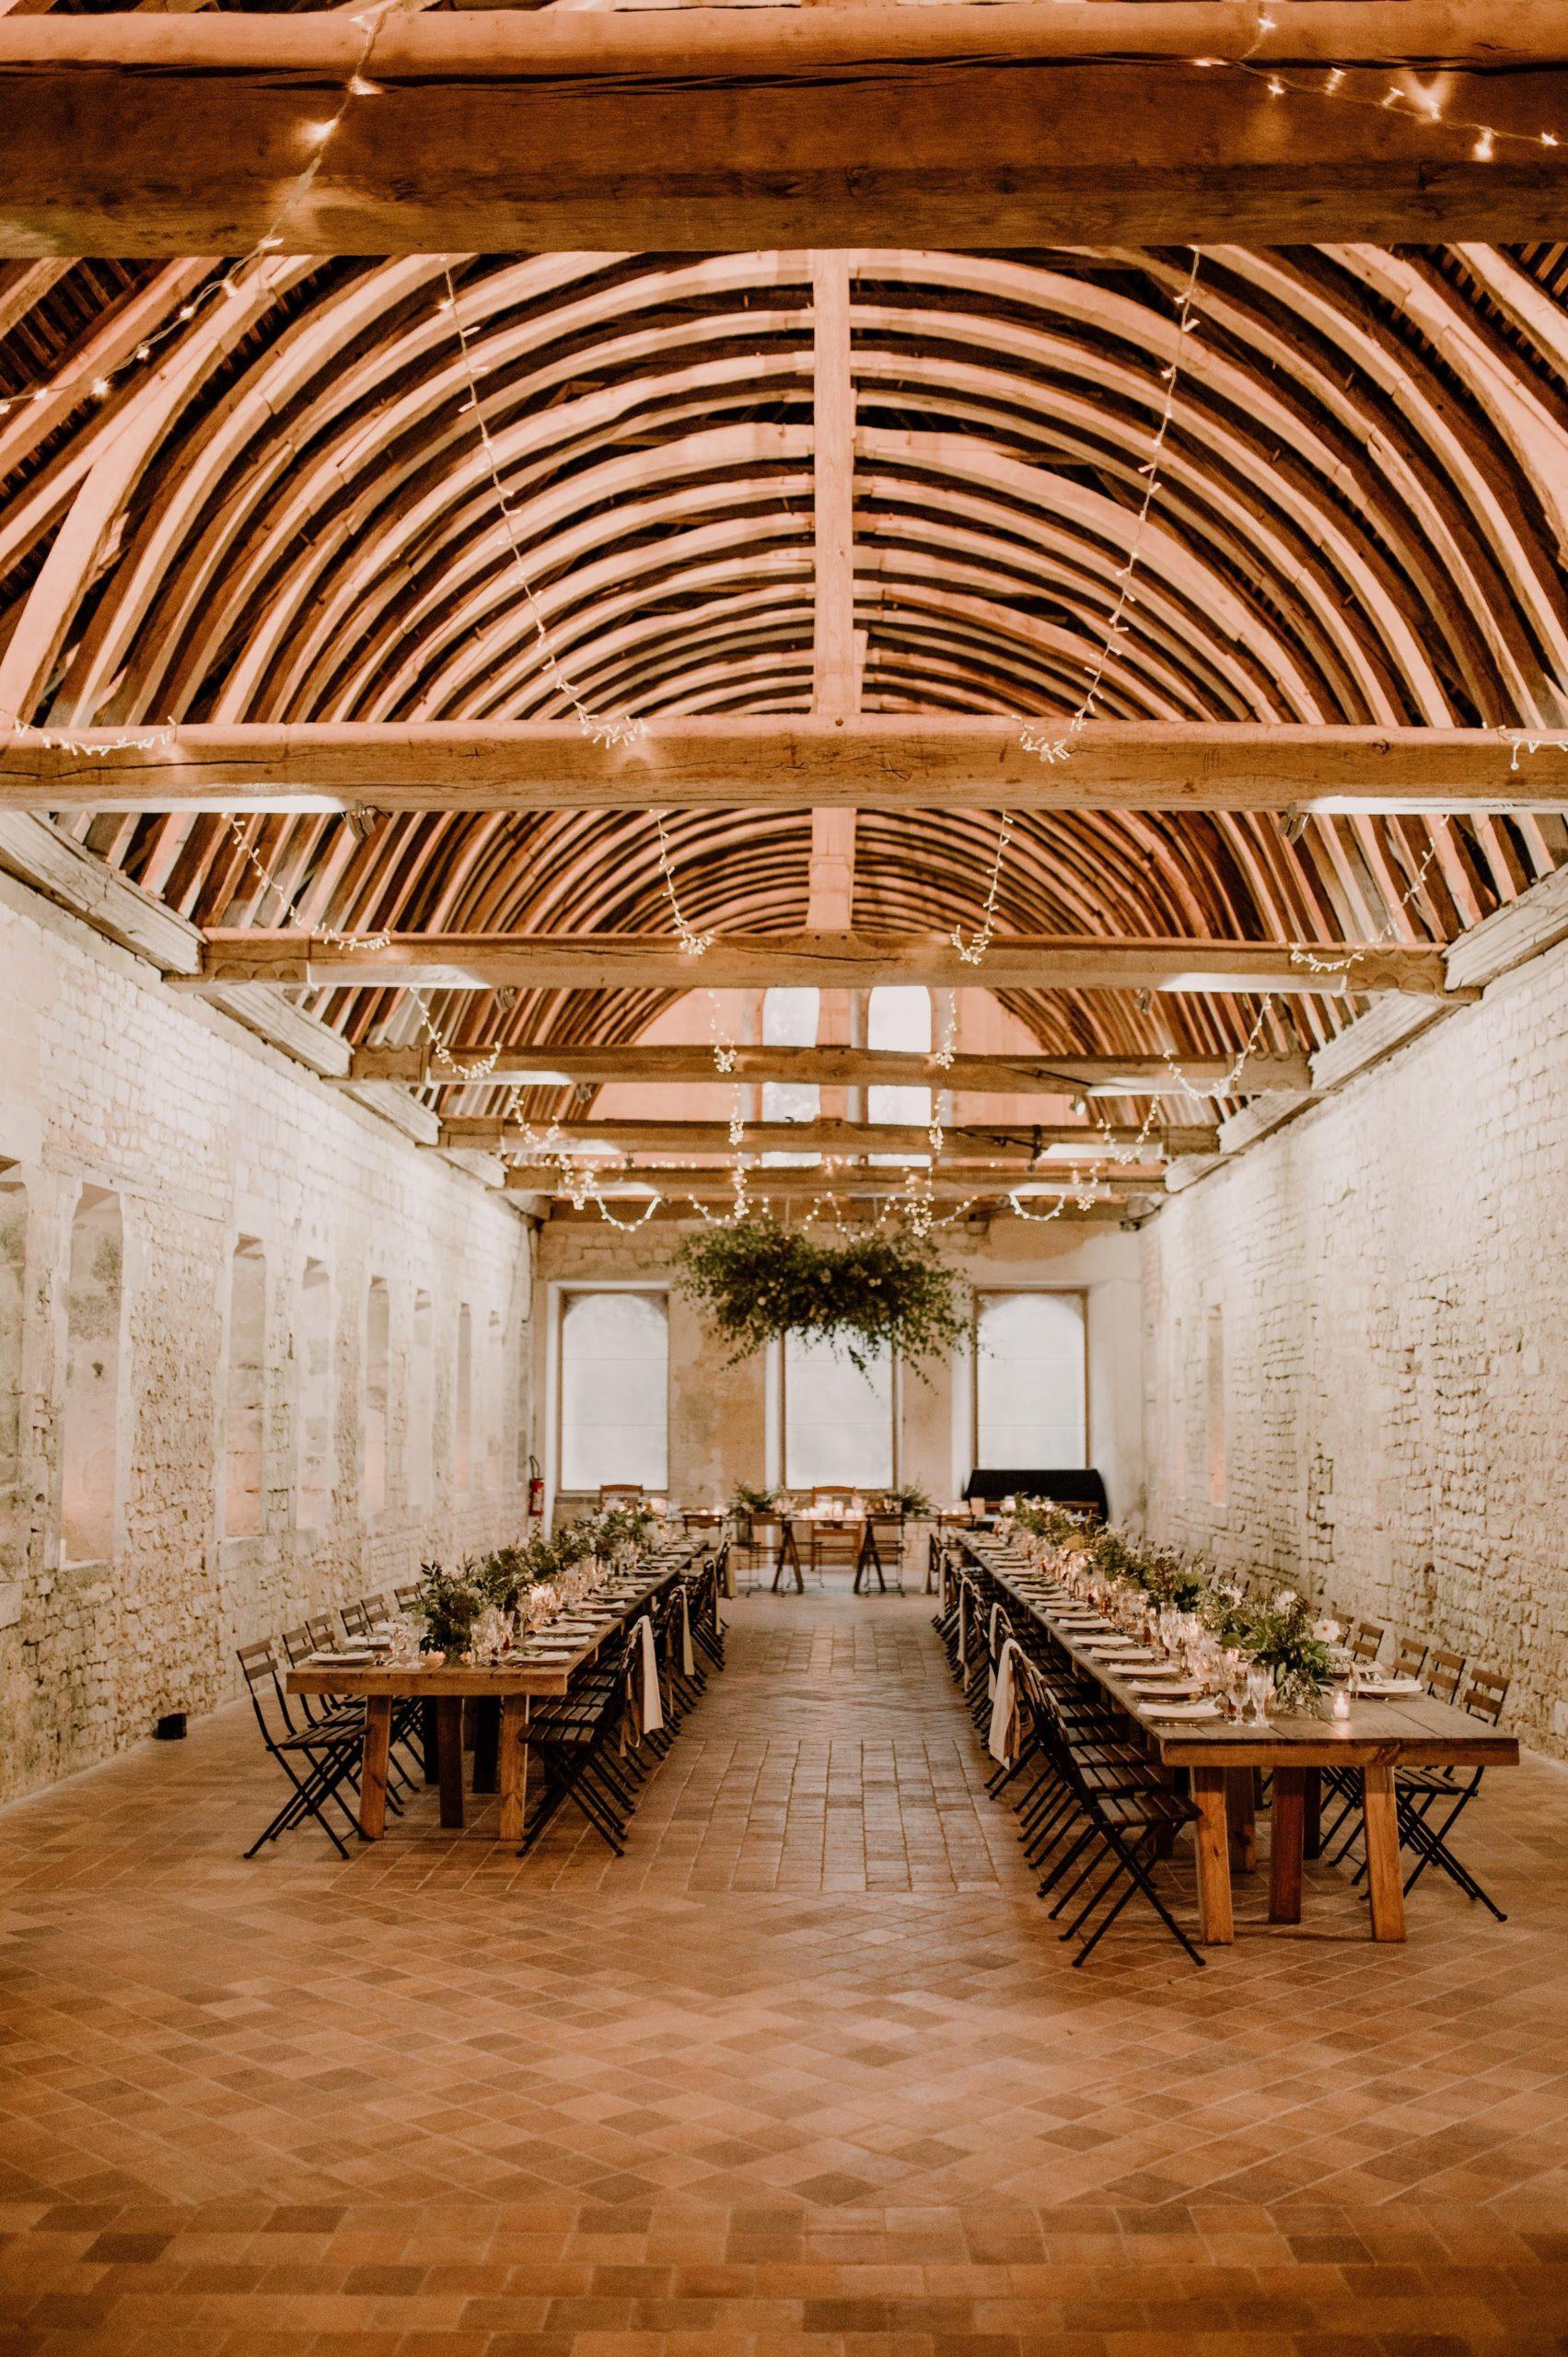 Reflets - Fleuriste mariage - Mariage végétal Abbaye Fontaine Guerard Normandie